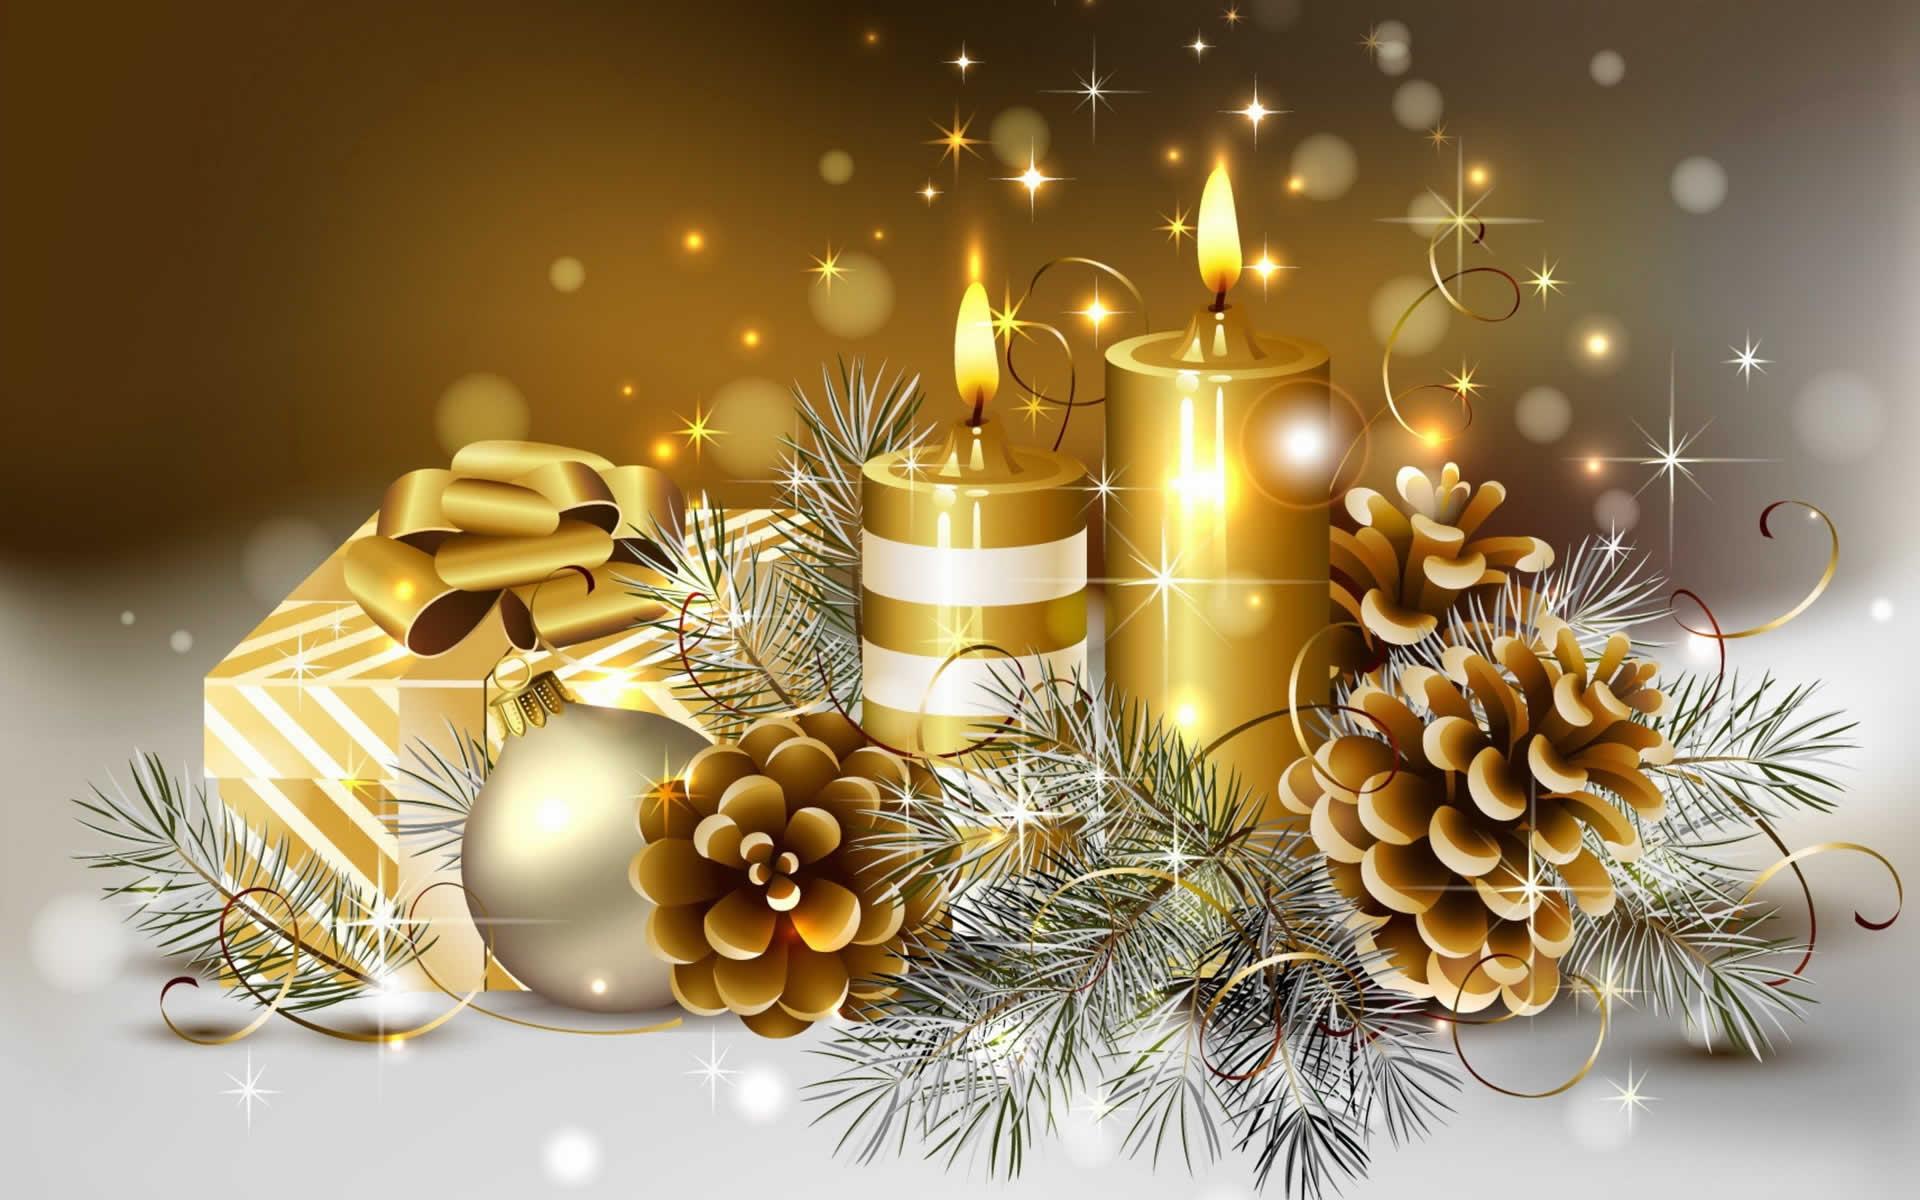 Sfondo Natalizio - Sfondo natalizio gratis